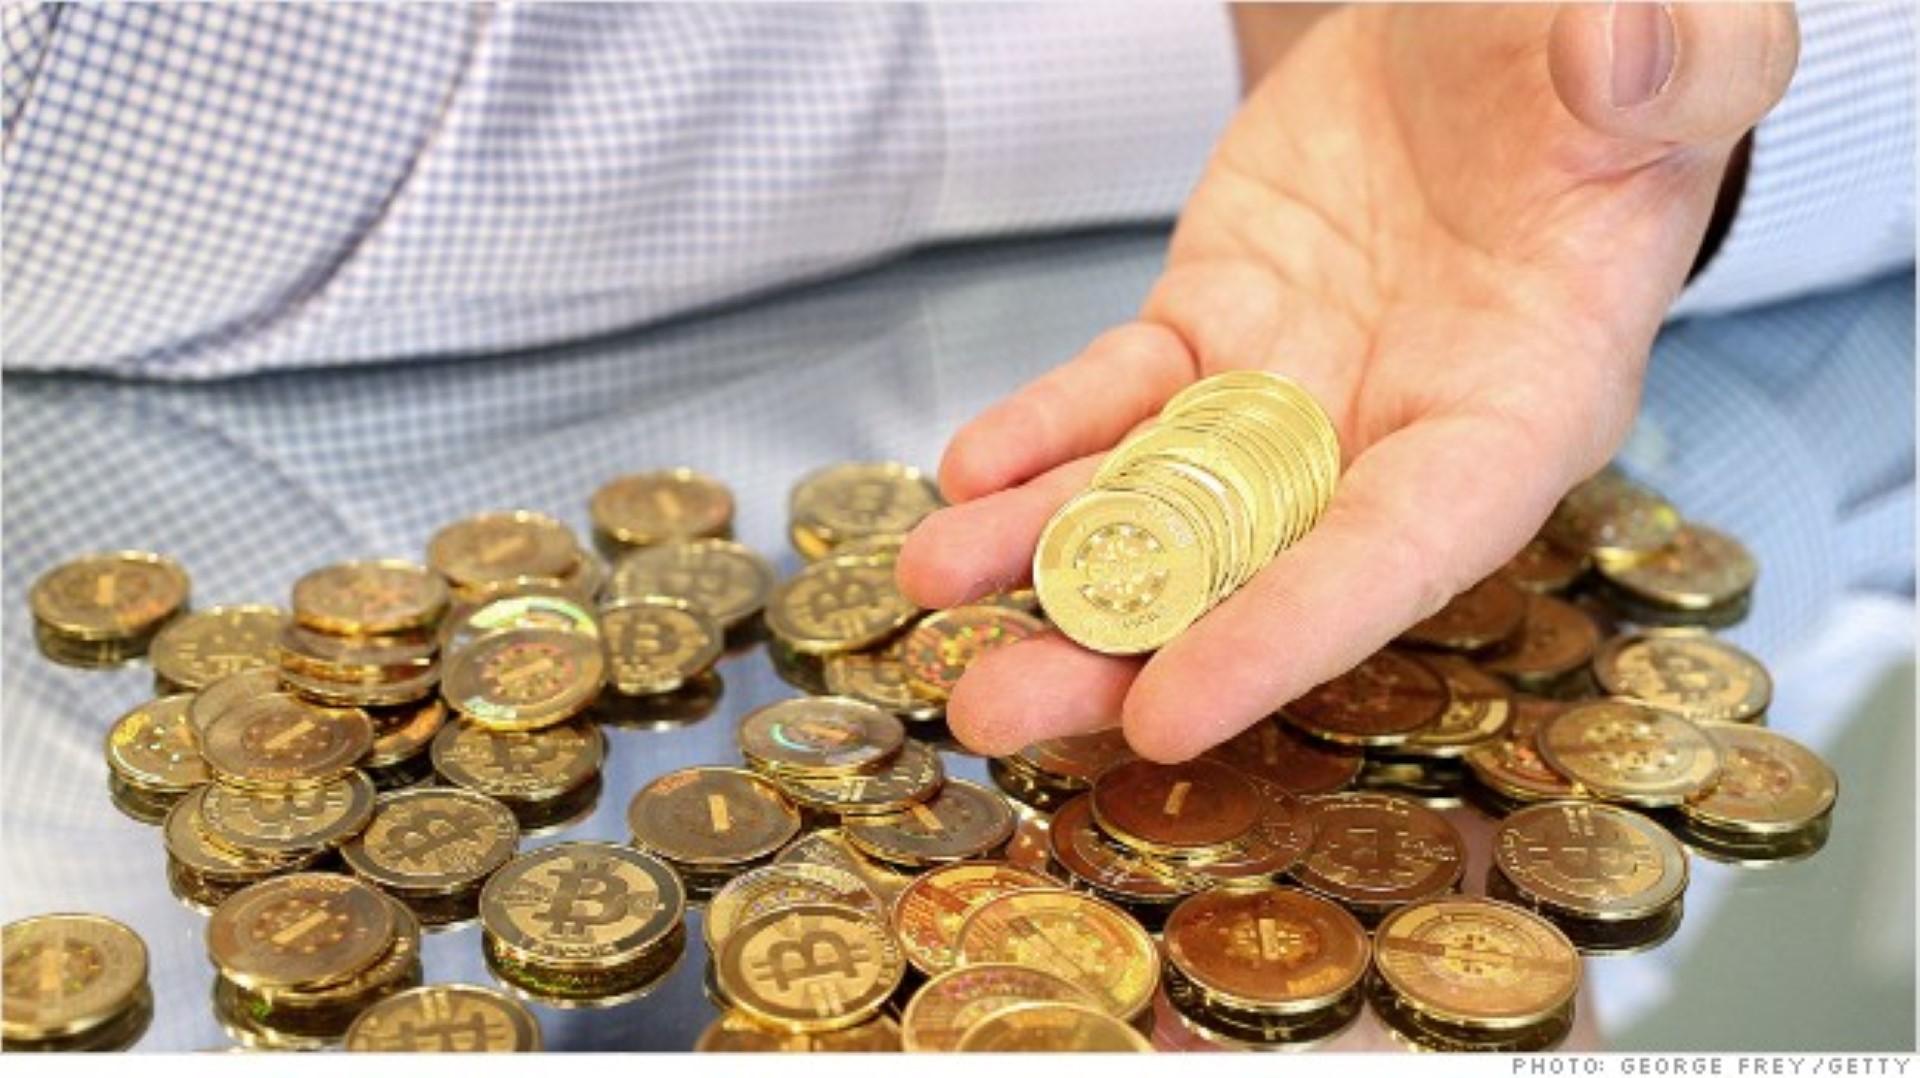 https://www.tyracpa.com/wp-content/uploads/2014/08/Bitcoin-Lending-Large.jpg